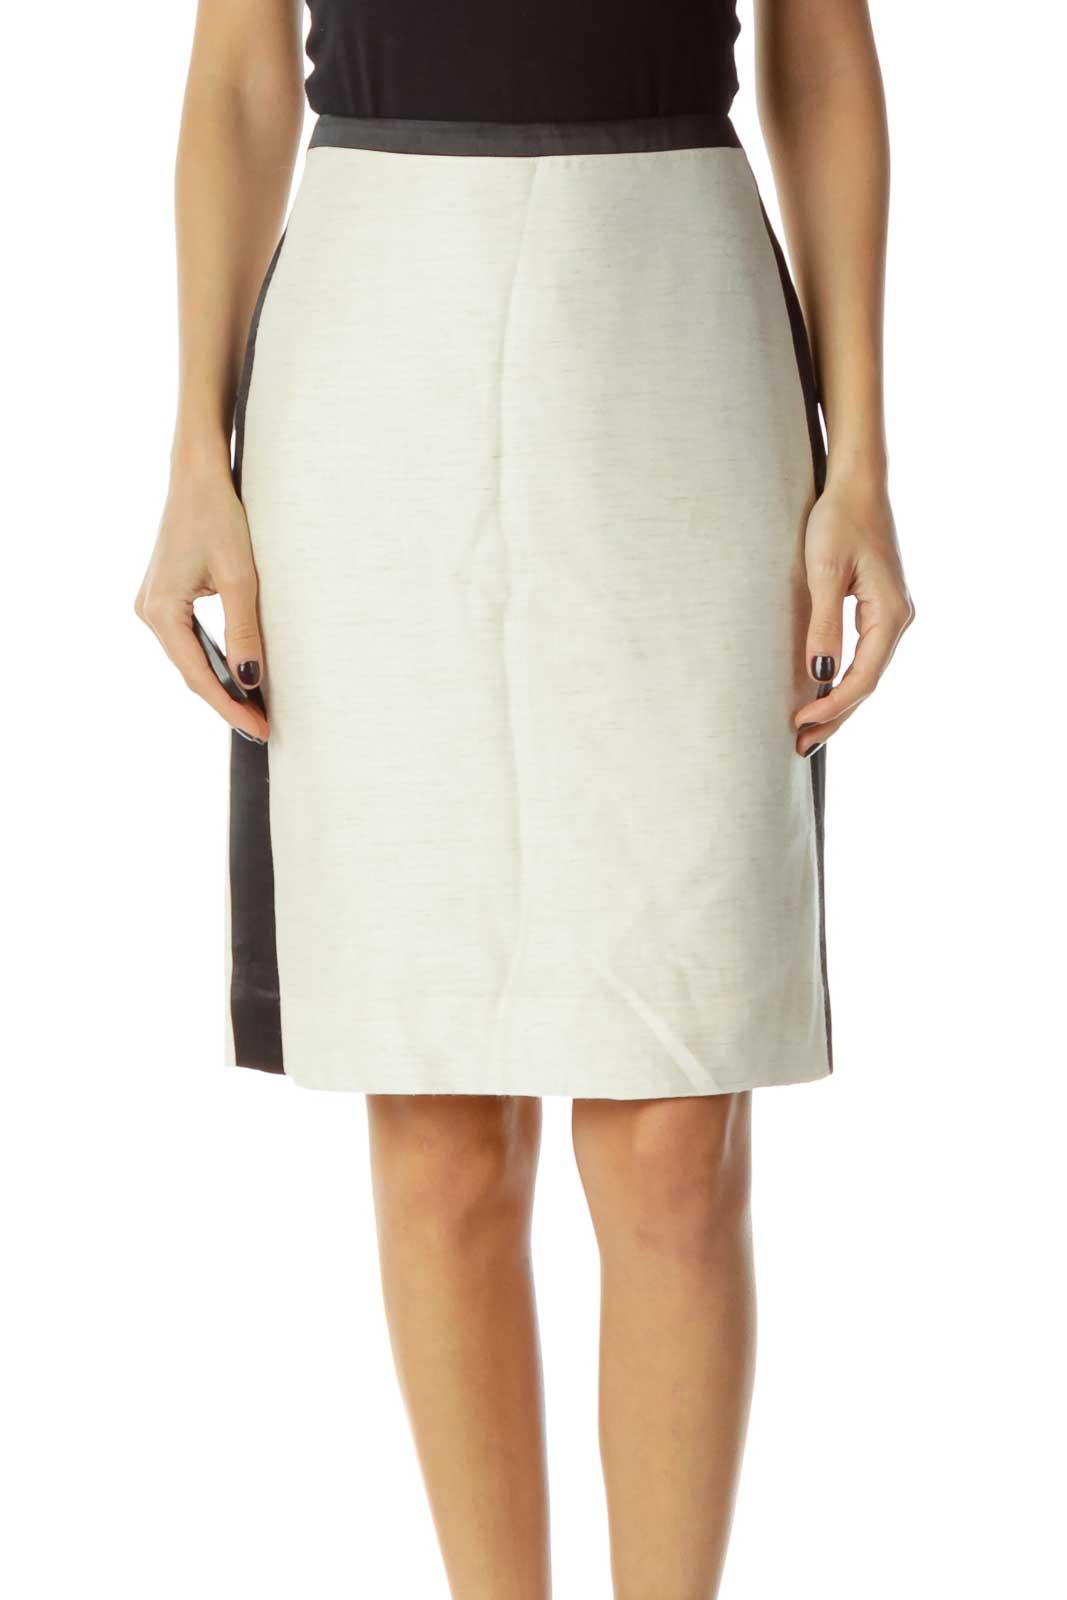 Cream Pencil Skirt Front